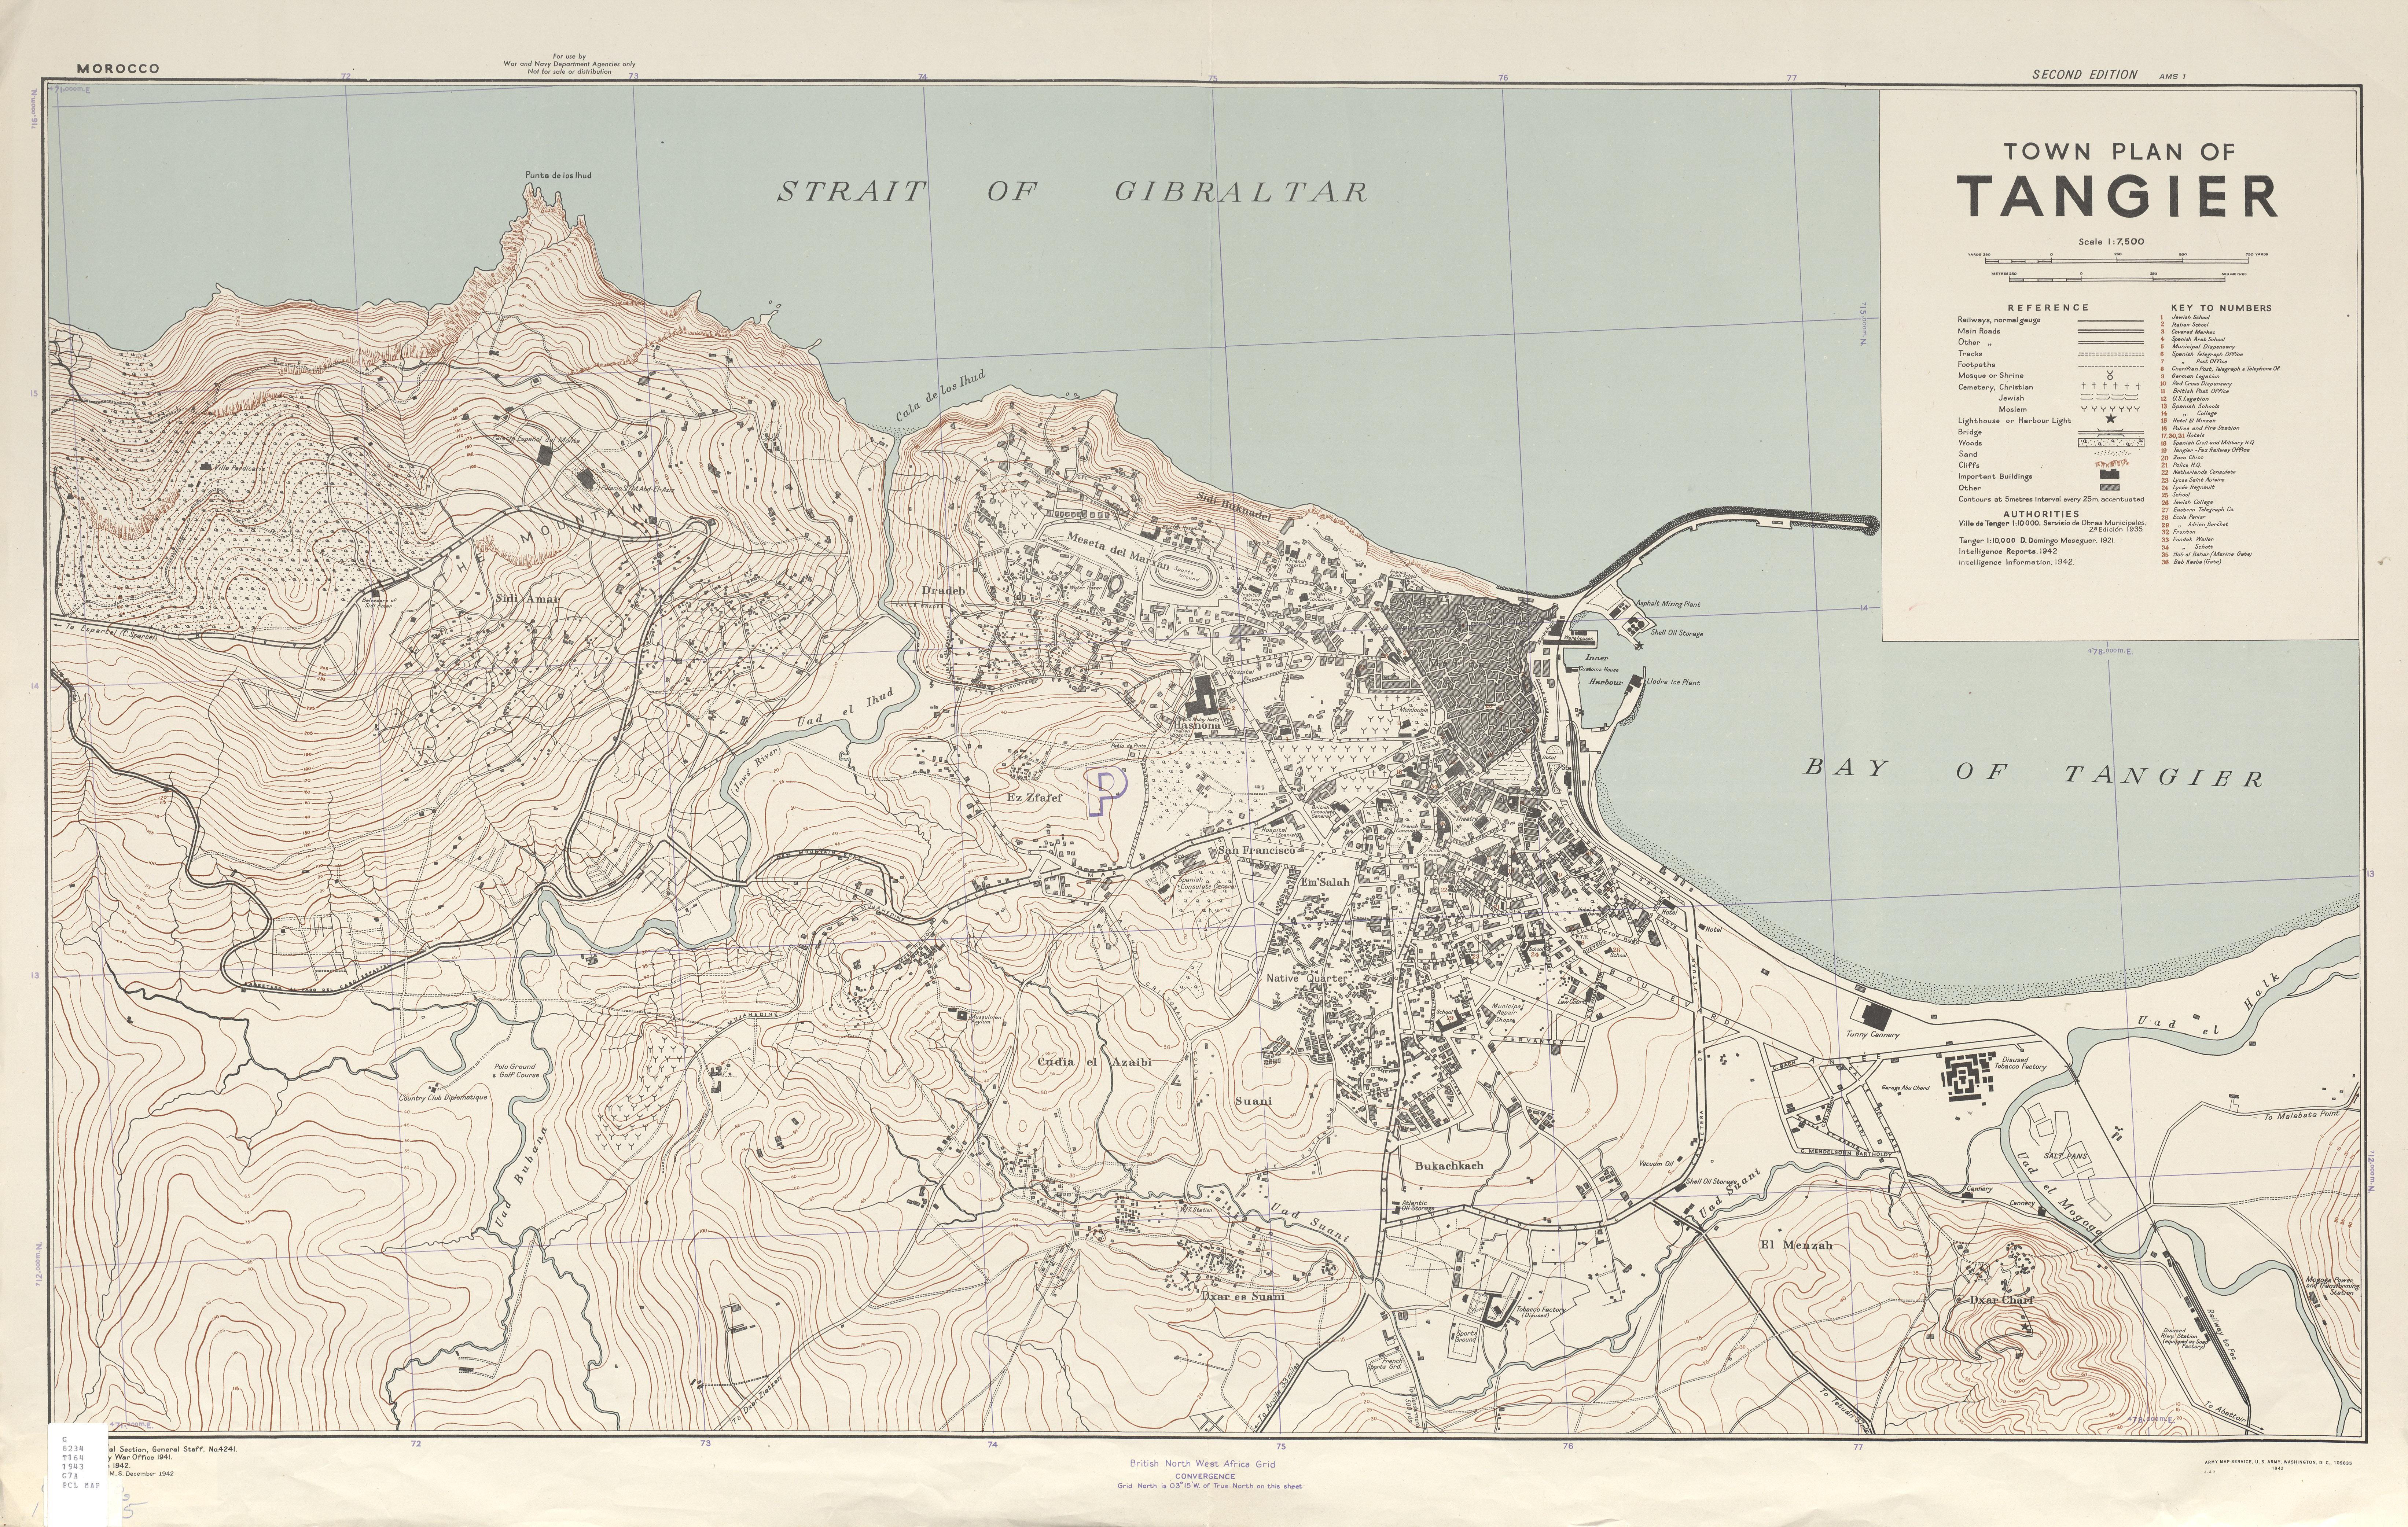 Mapa de la Ciudad de Tánger, Marruecos 1943